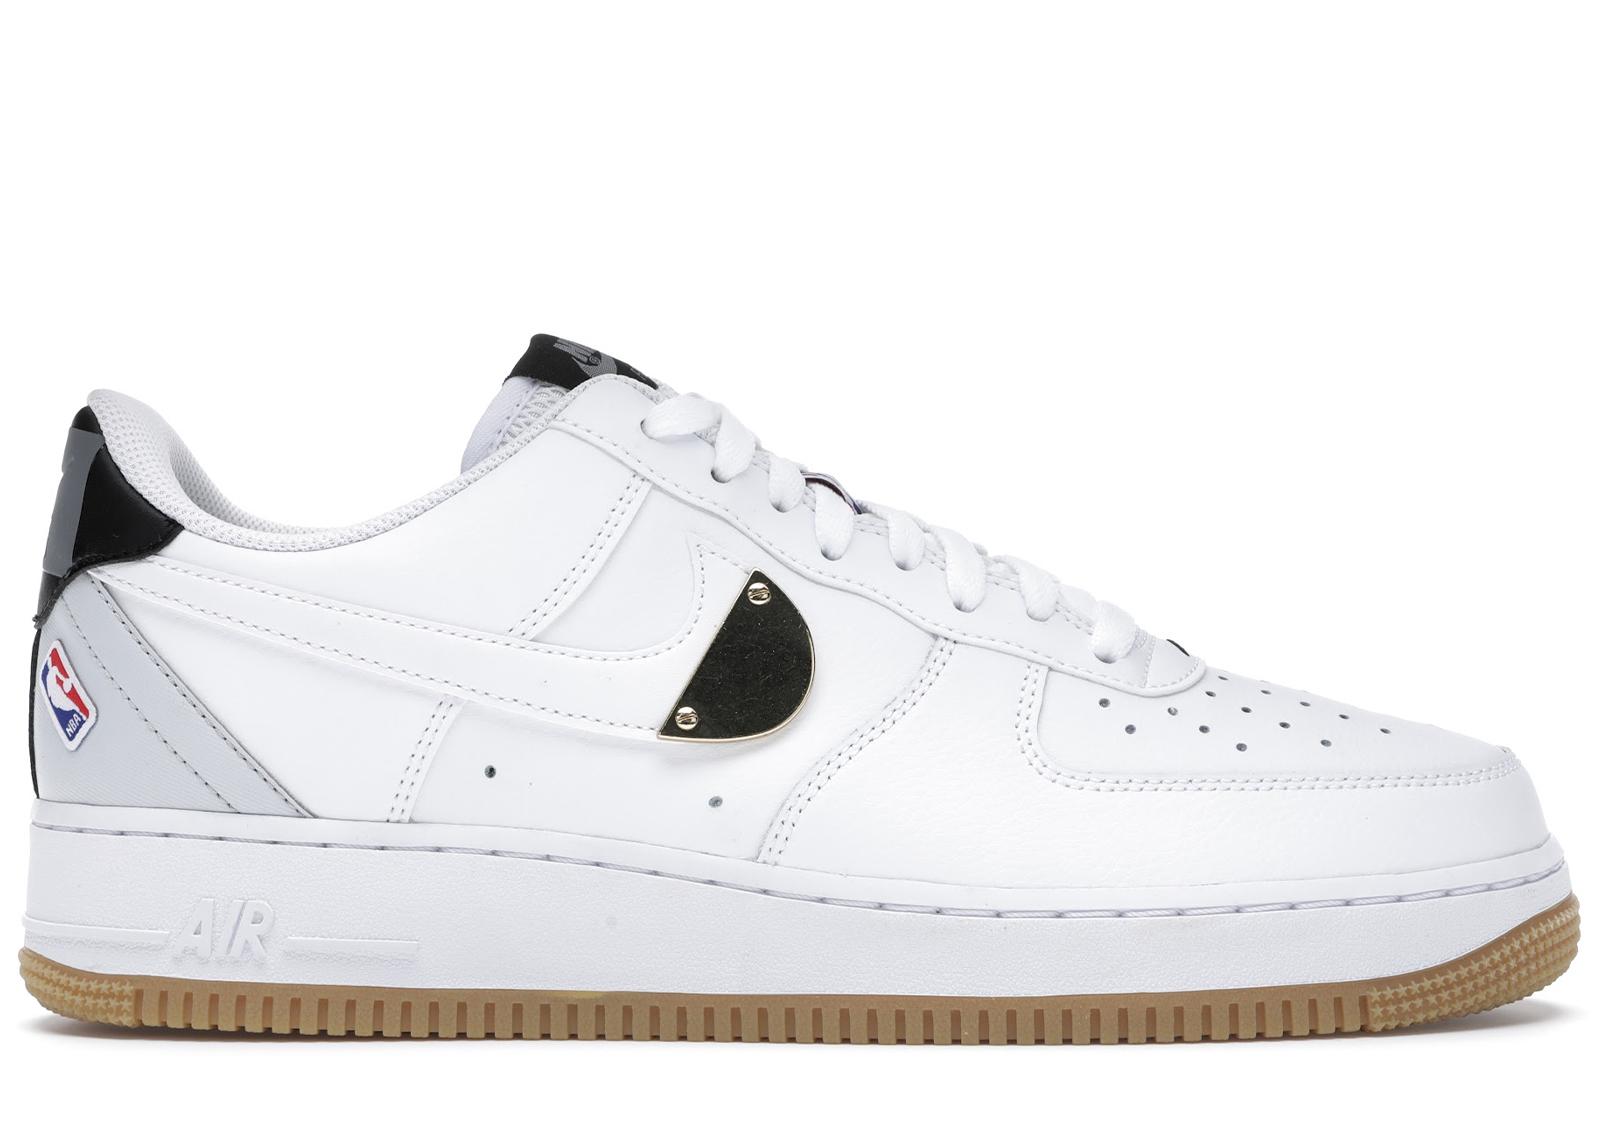 Nike Air Force 1 Low NBA White Grey Gum